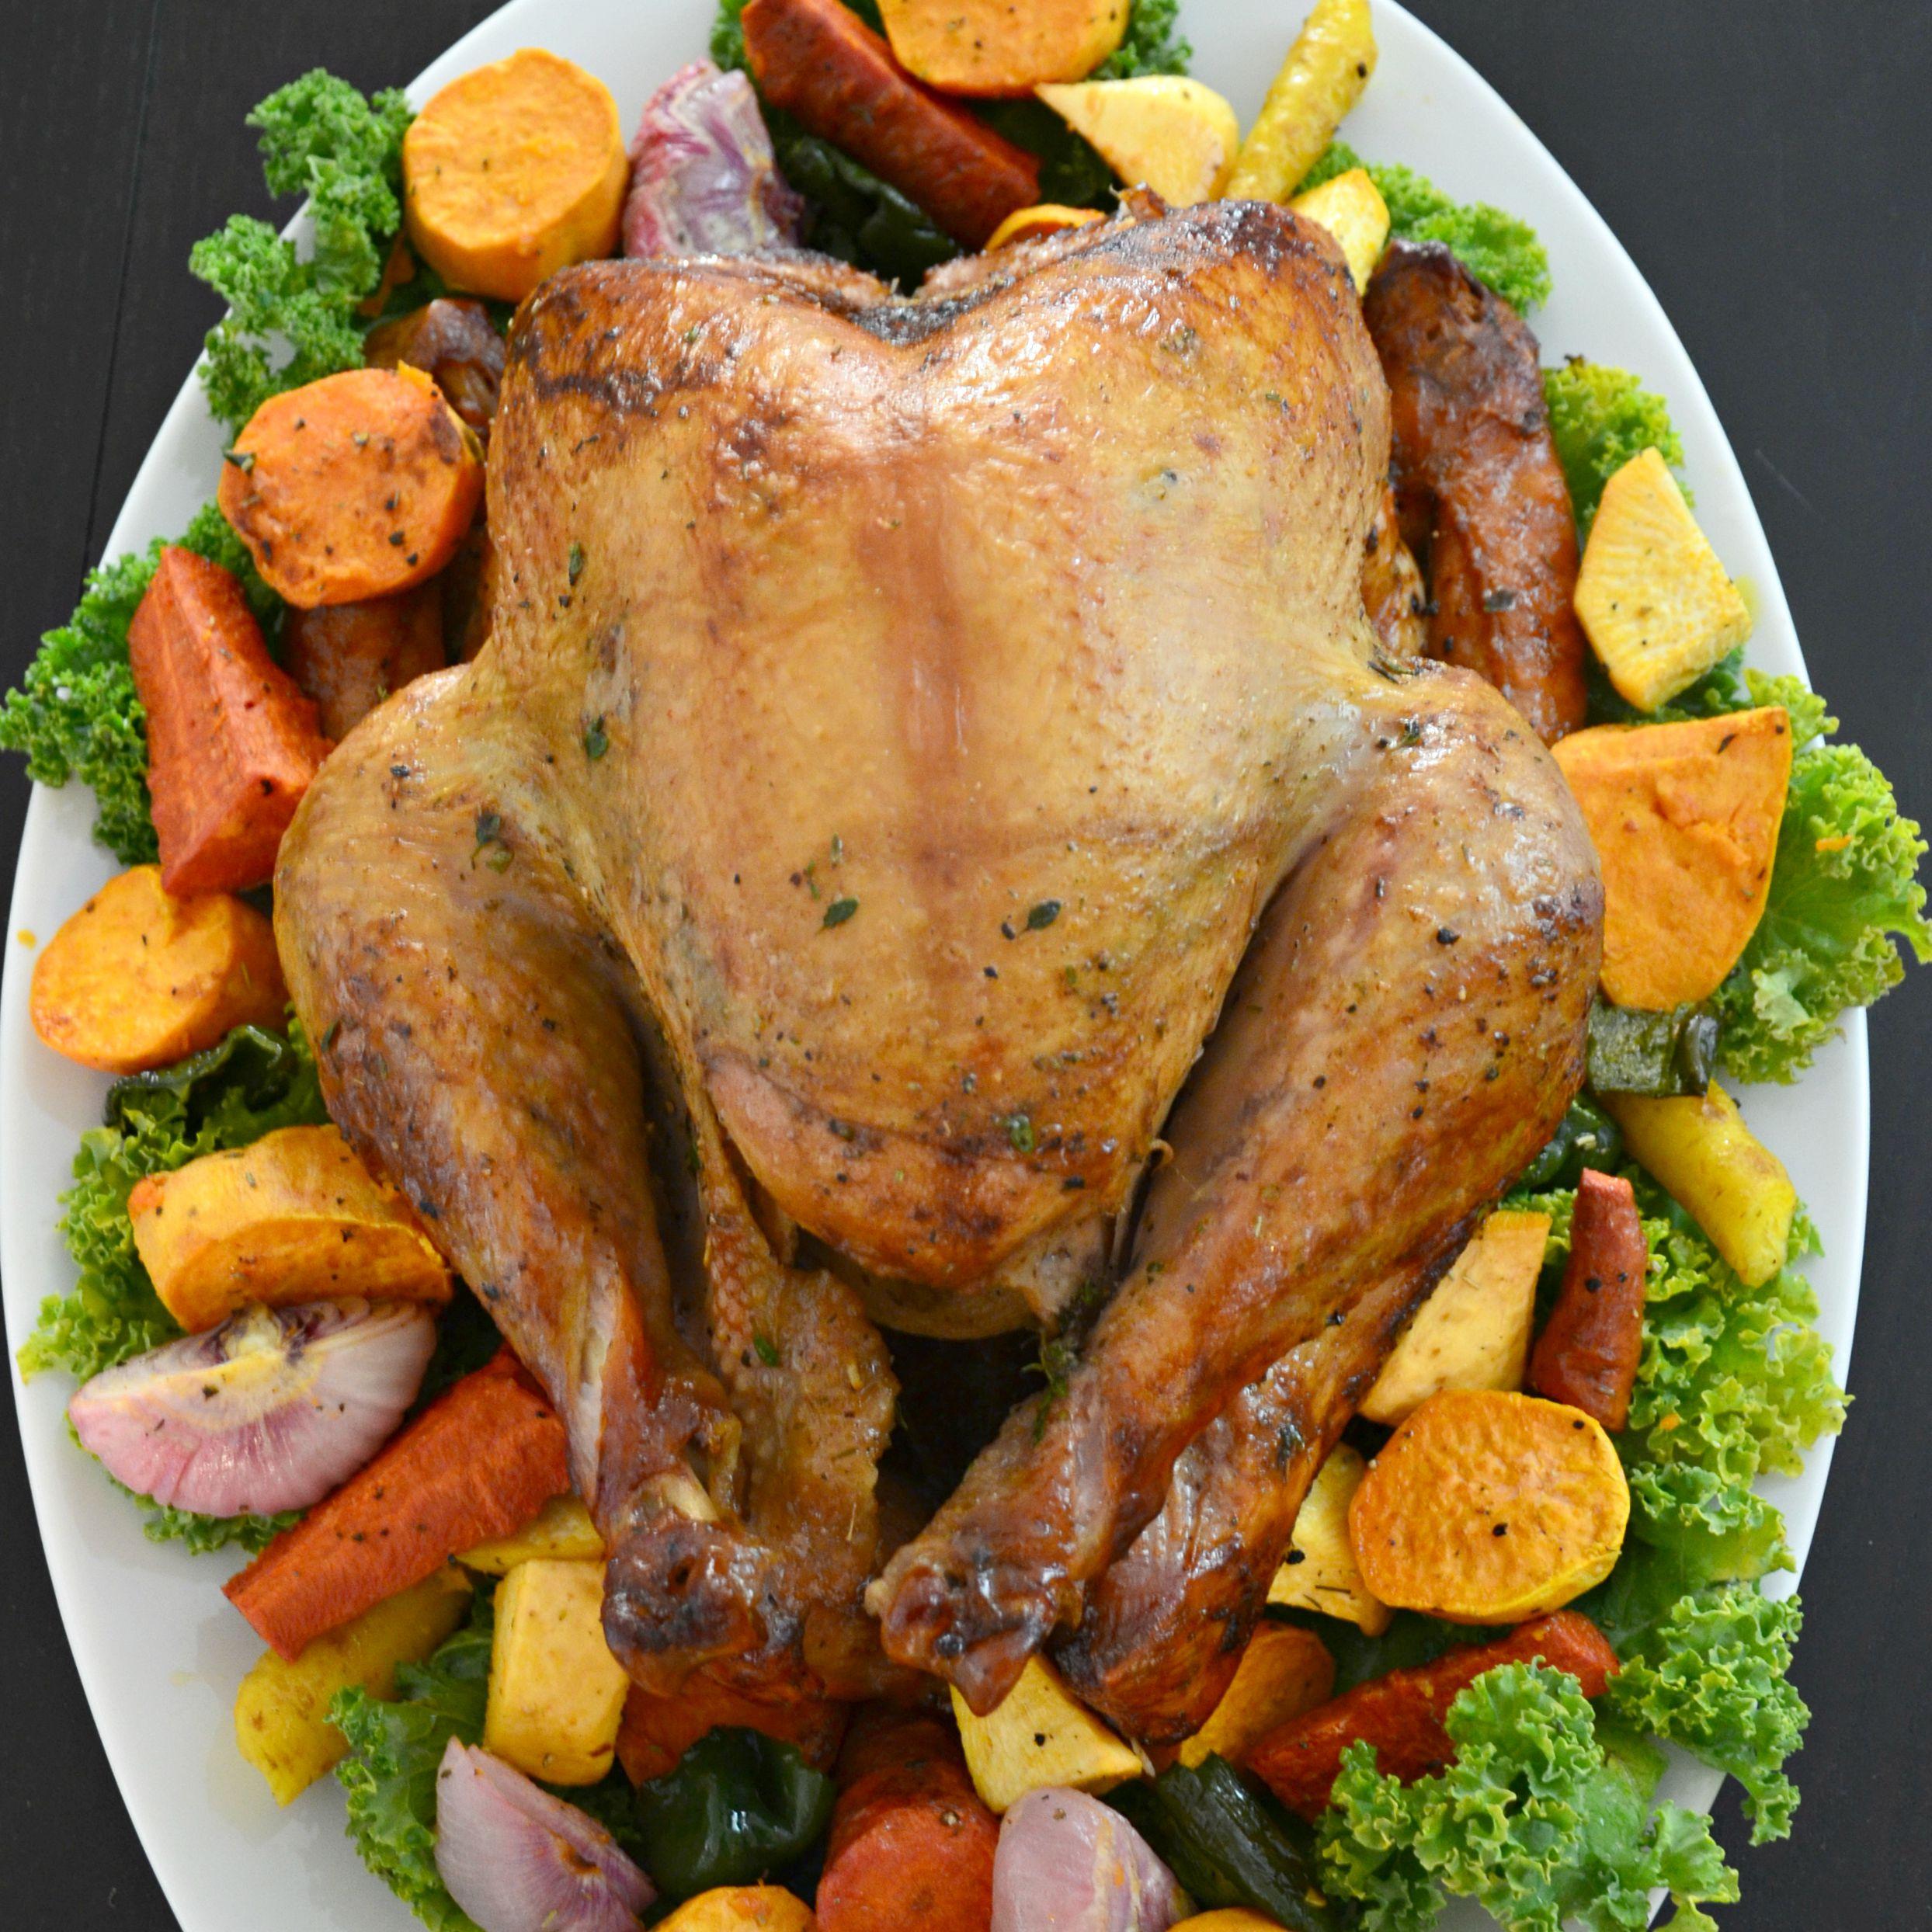 25 Best Christmas BBQ Recipes